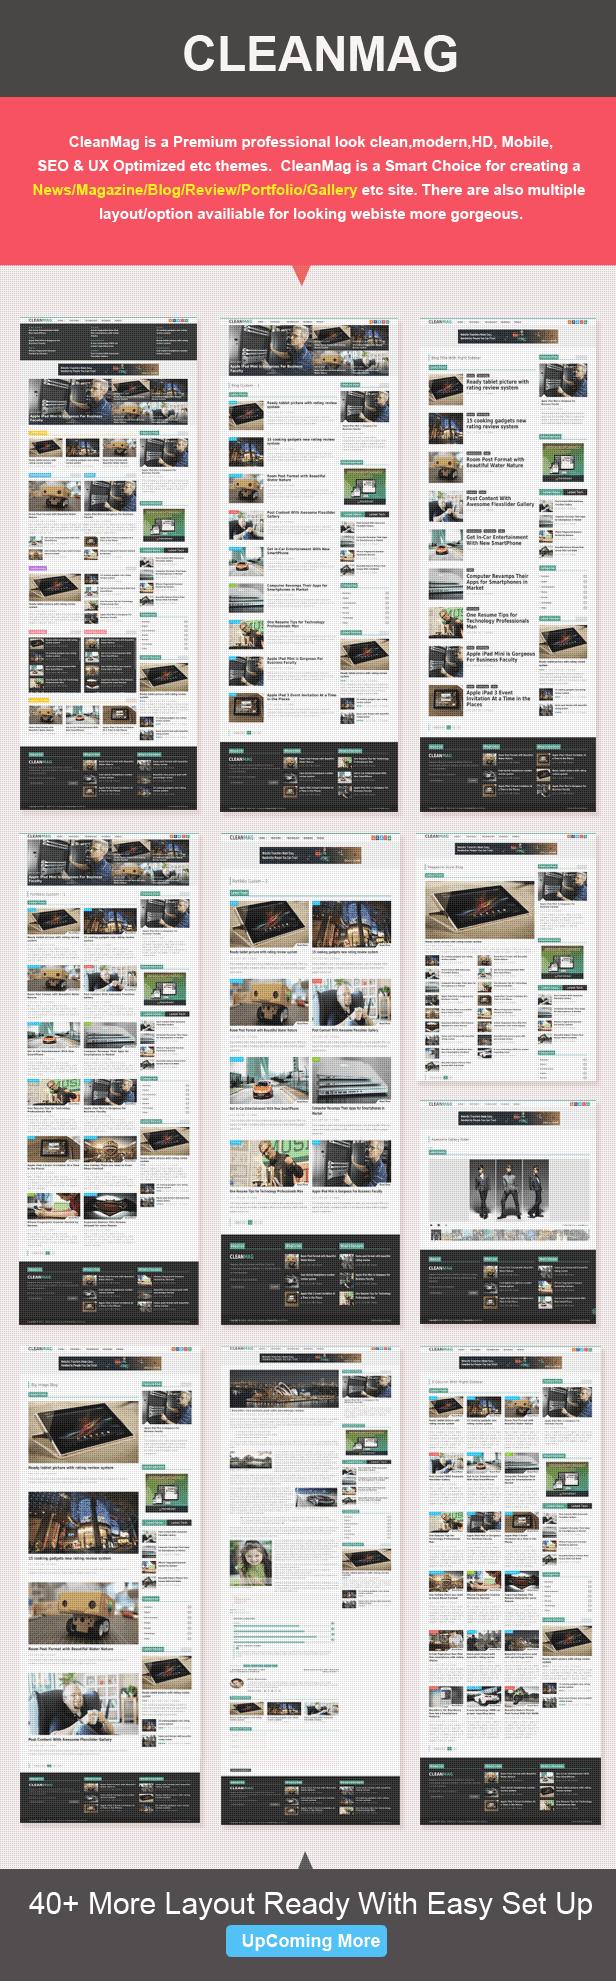 Cleanmag - Multipurpose Magazine WordPress Theme